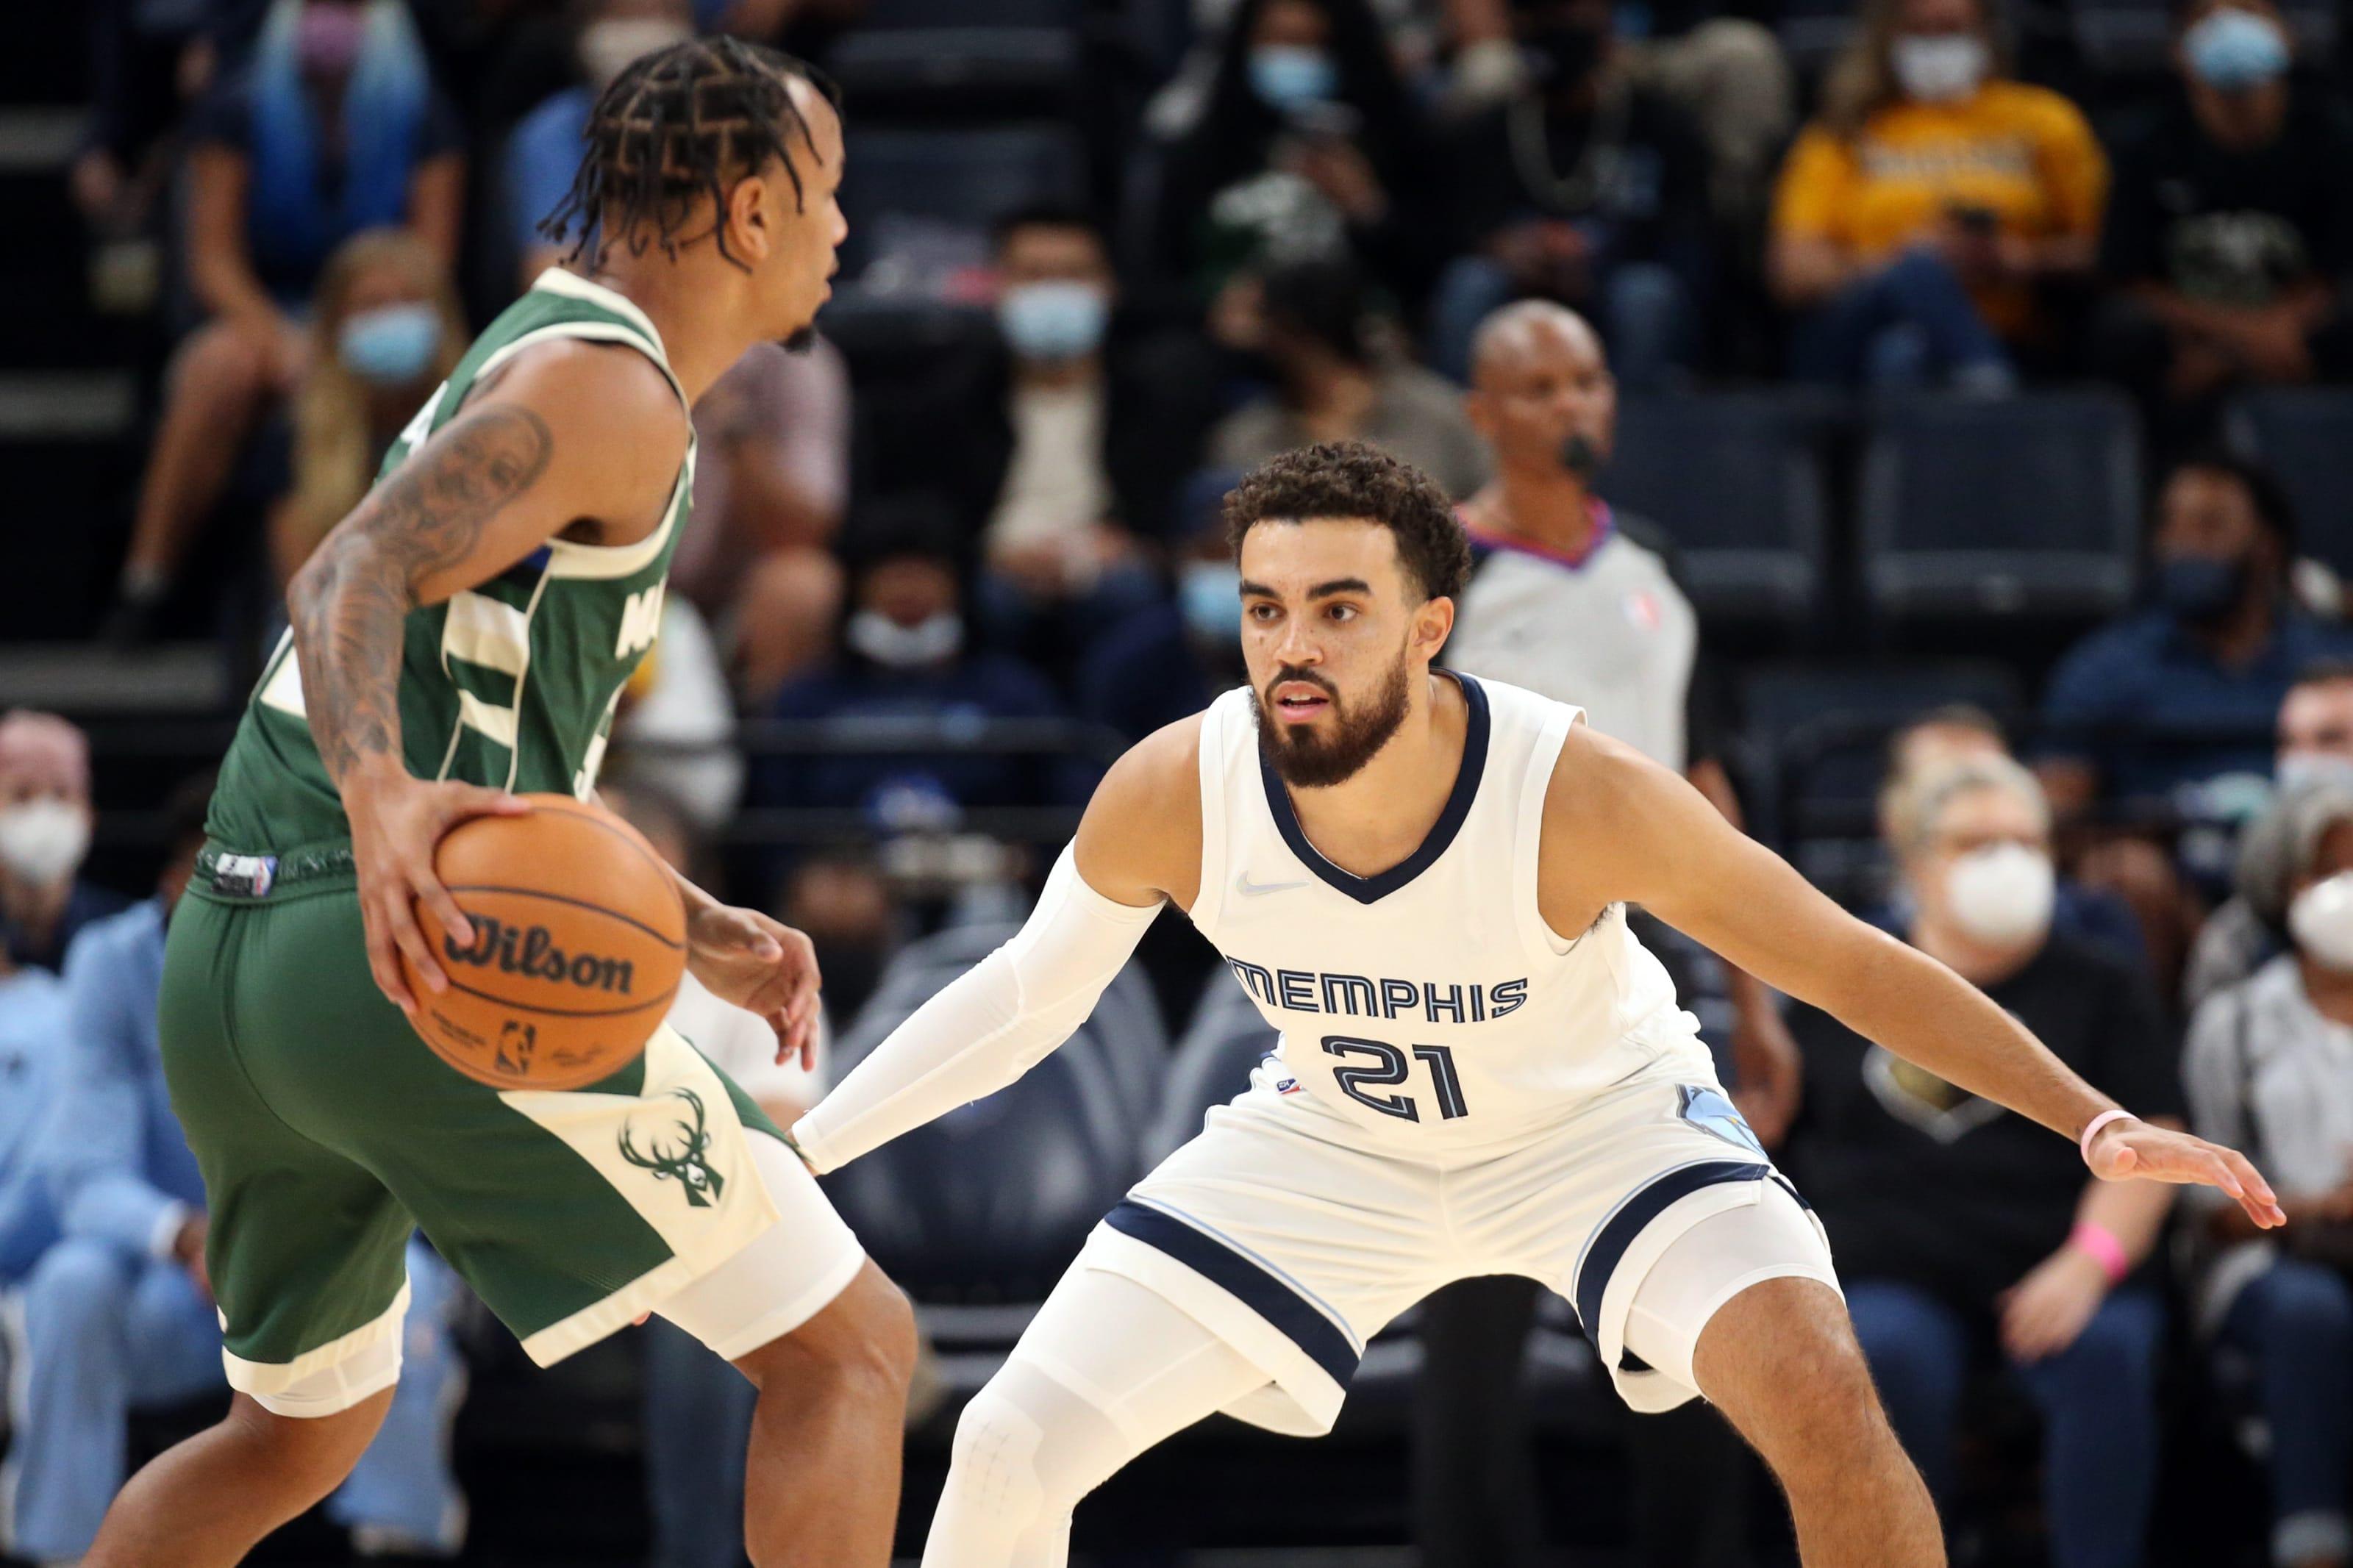 Milwaukee Bucks: Justin Robinson, Memphis Grizzlies: Tyus Jones